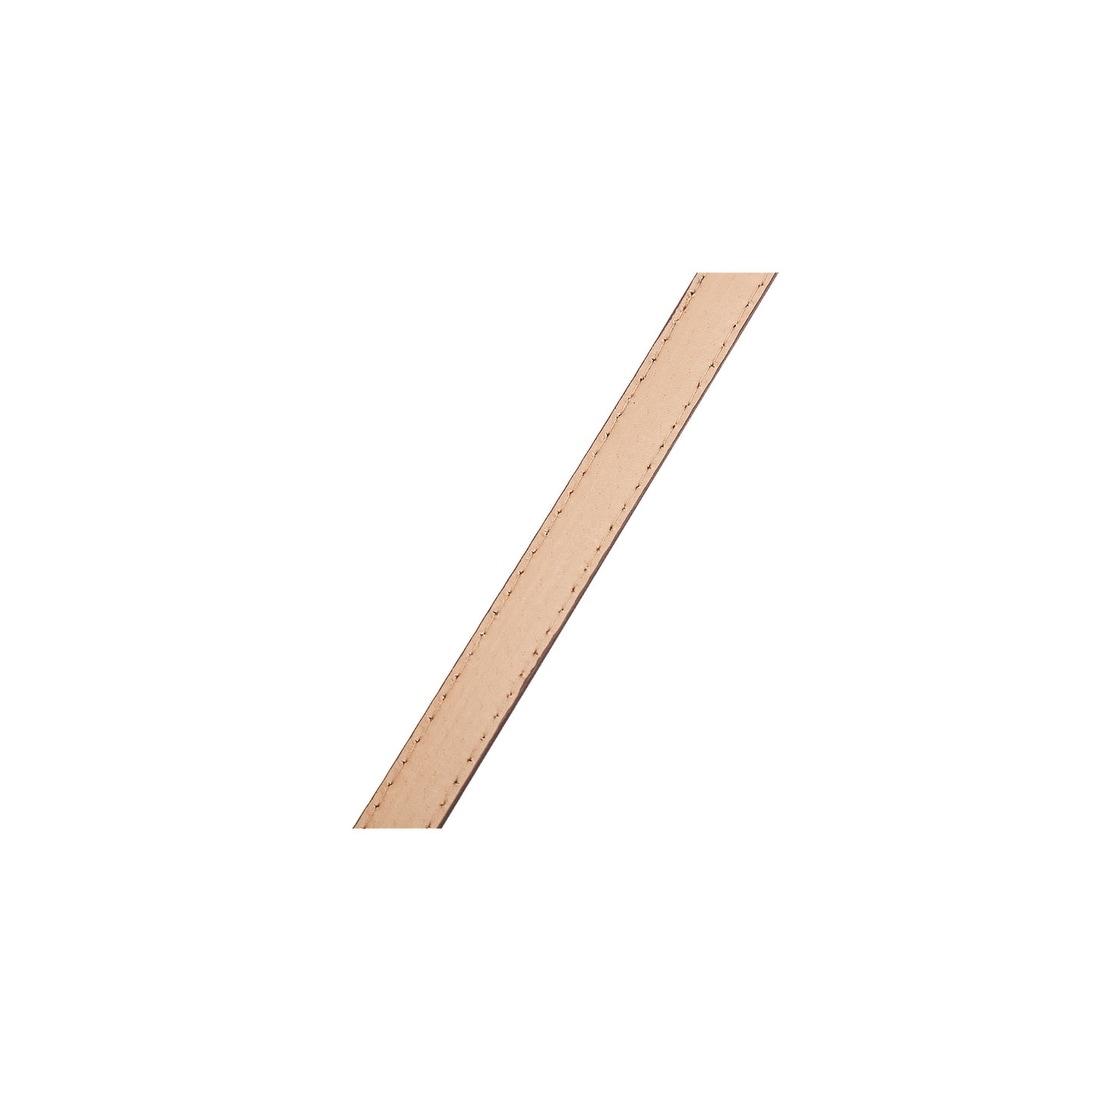 uxcell Womens Alligator Grain Embossed Single Oval Pin Buckle Slender Leather Belt Pink